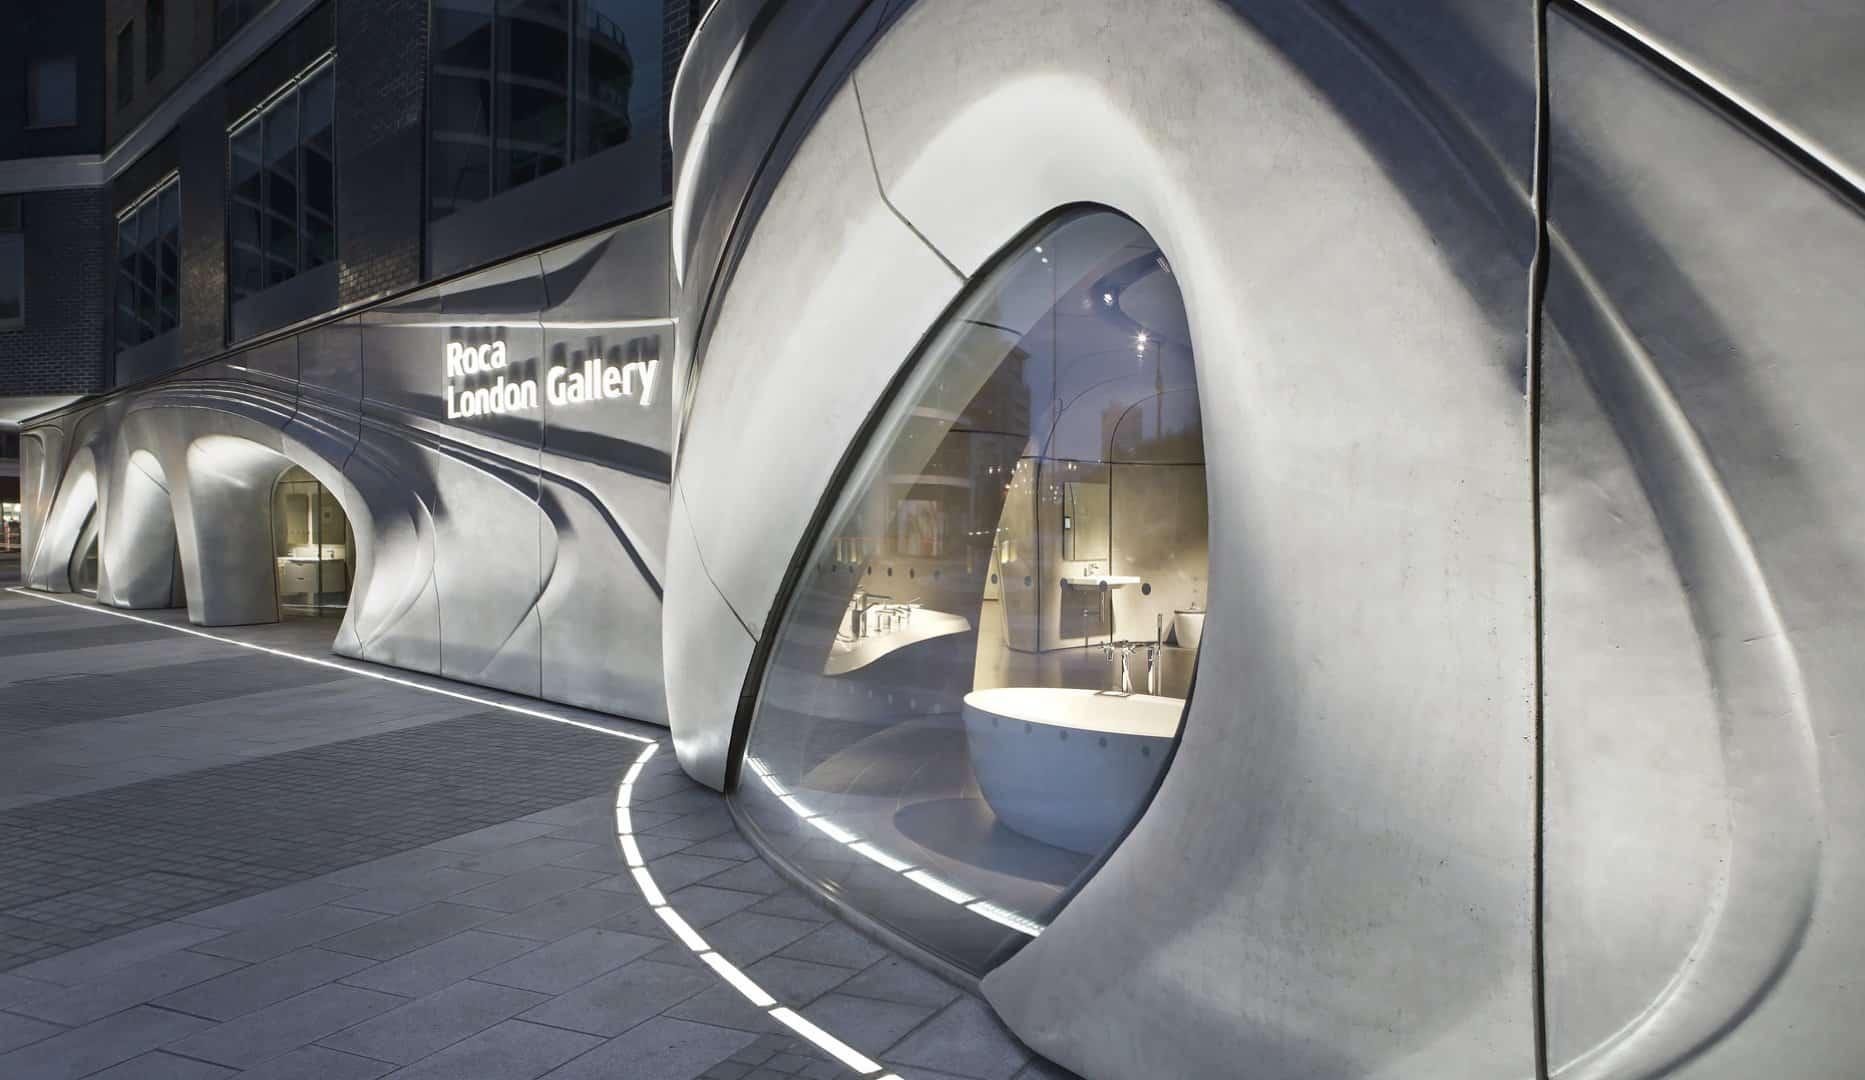 Zaha Hadid Product Design - the roca gallery london 018b